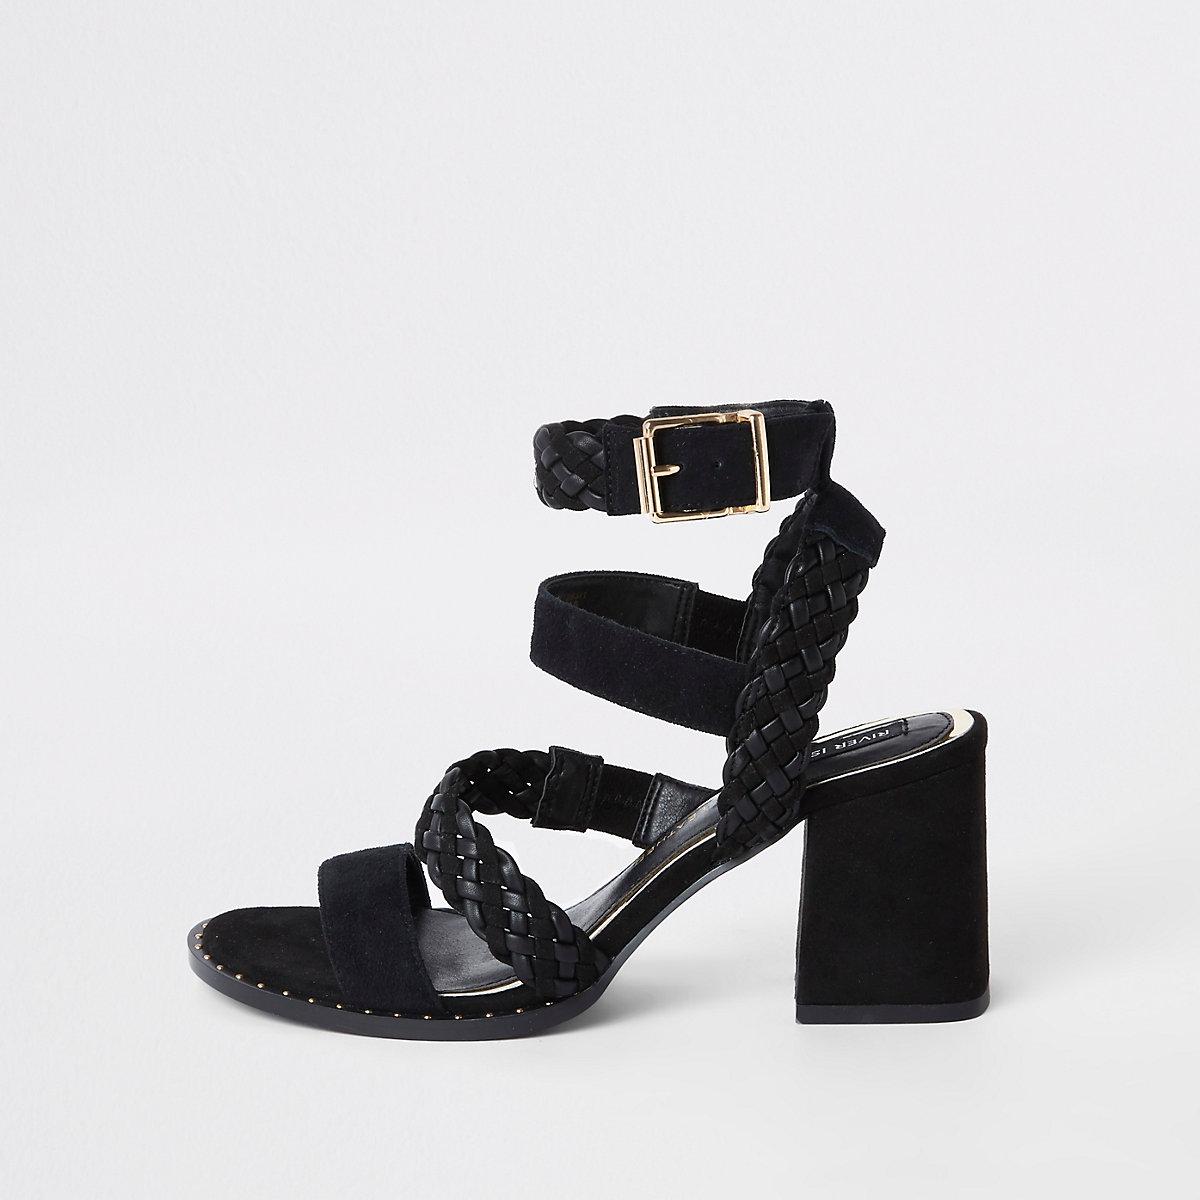 Black leather strappy block heel sandals